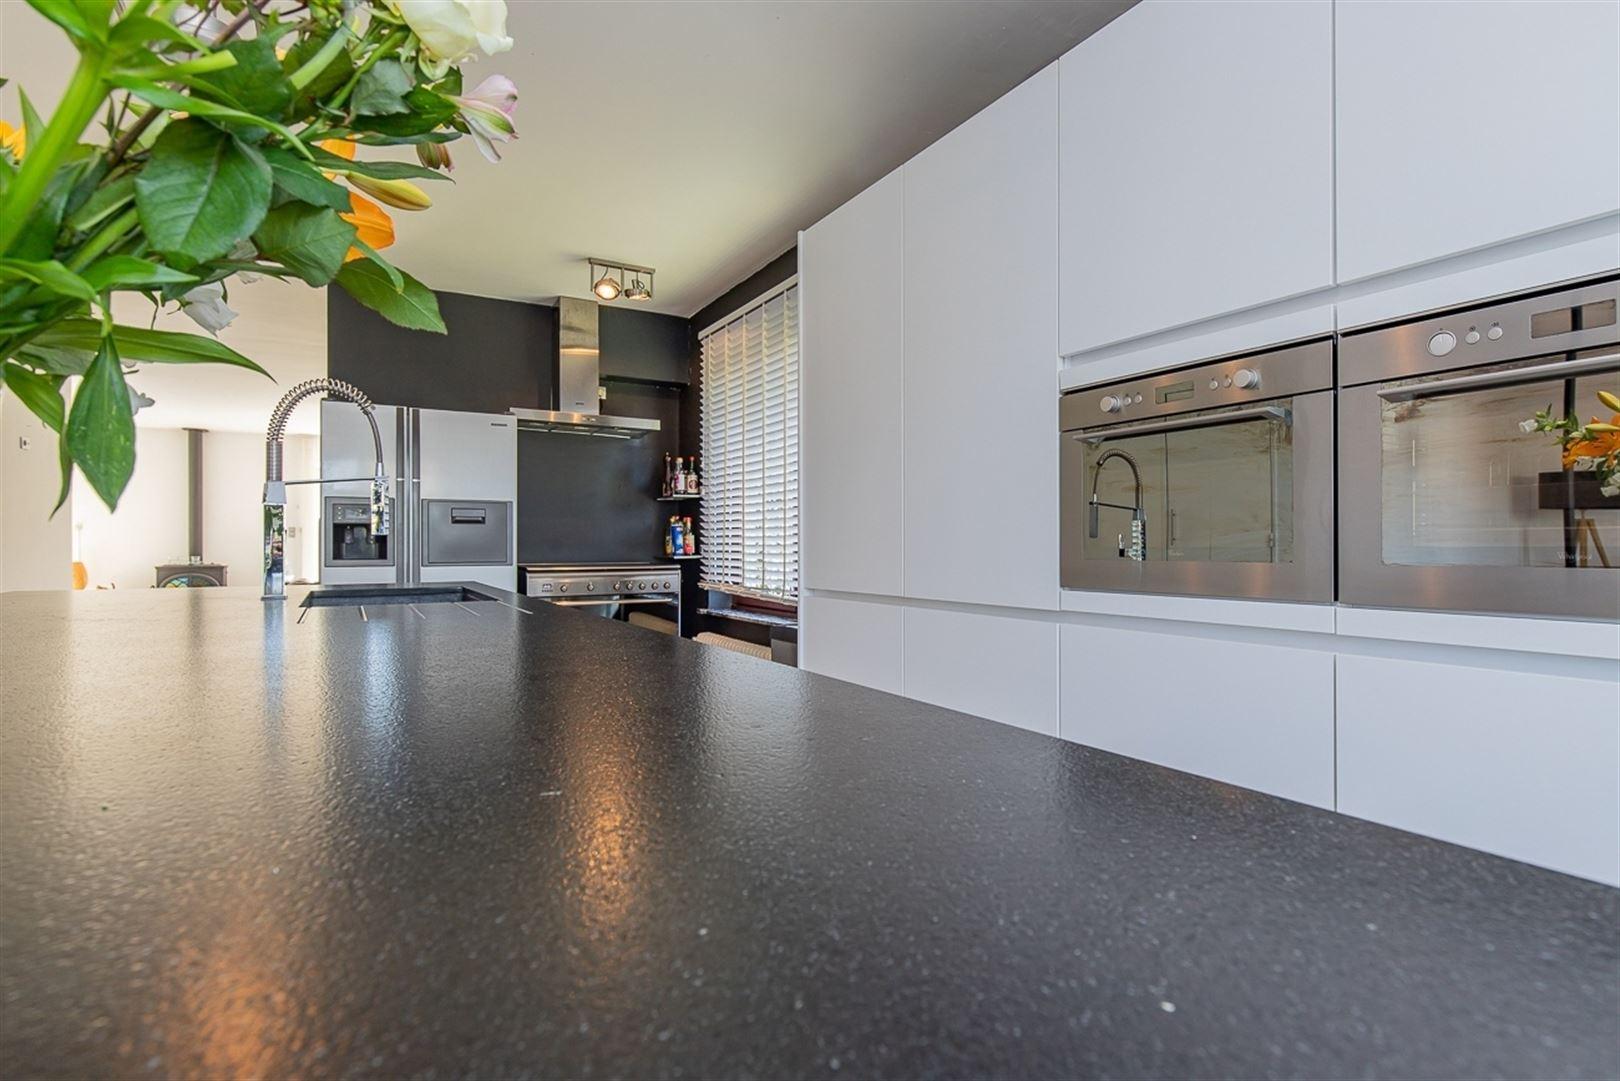 Foto 7 : Villa te 9100 SINT-NIKLAAS (België) - Prijs € 549.000